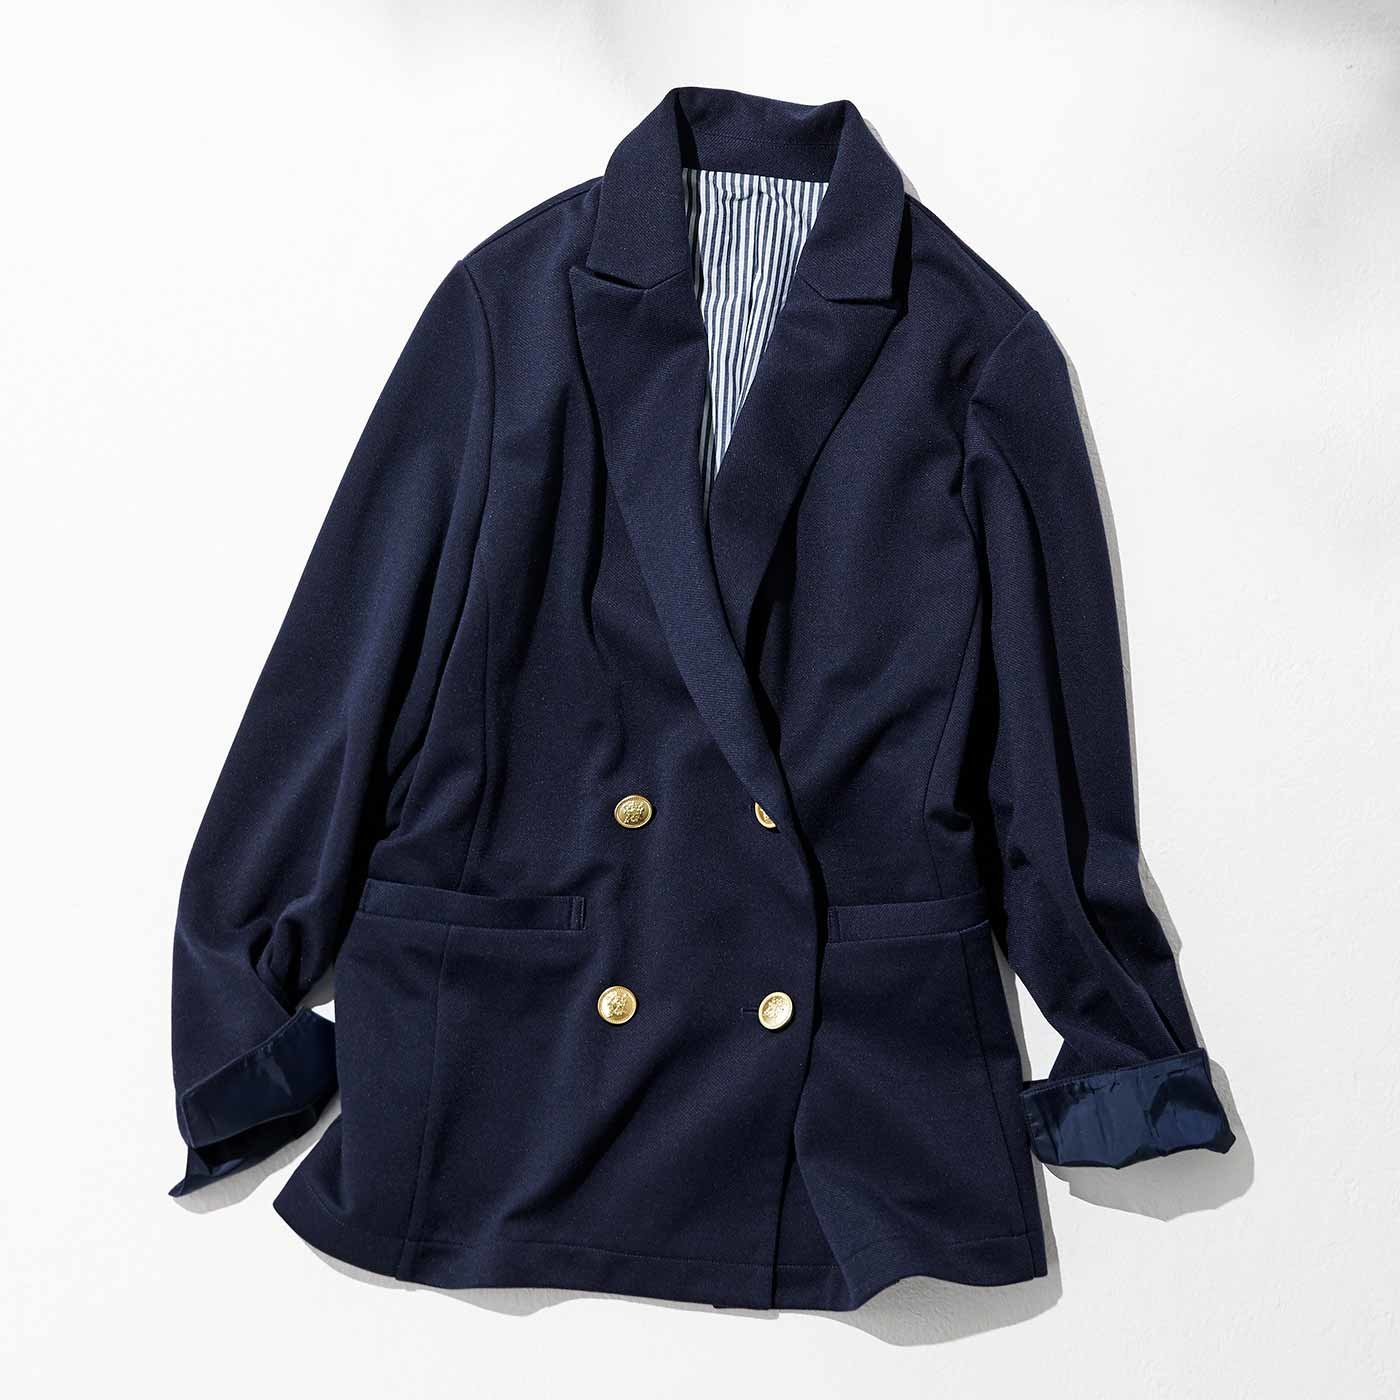 IEDIT[イディット] すっきりこなれ見え カットソー素材の紺ブレジャケット